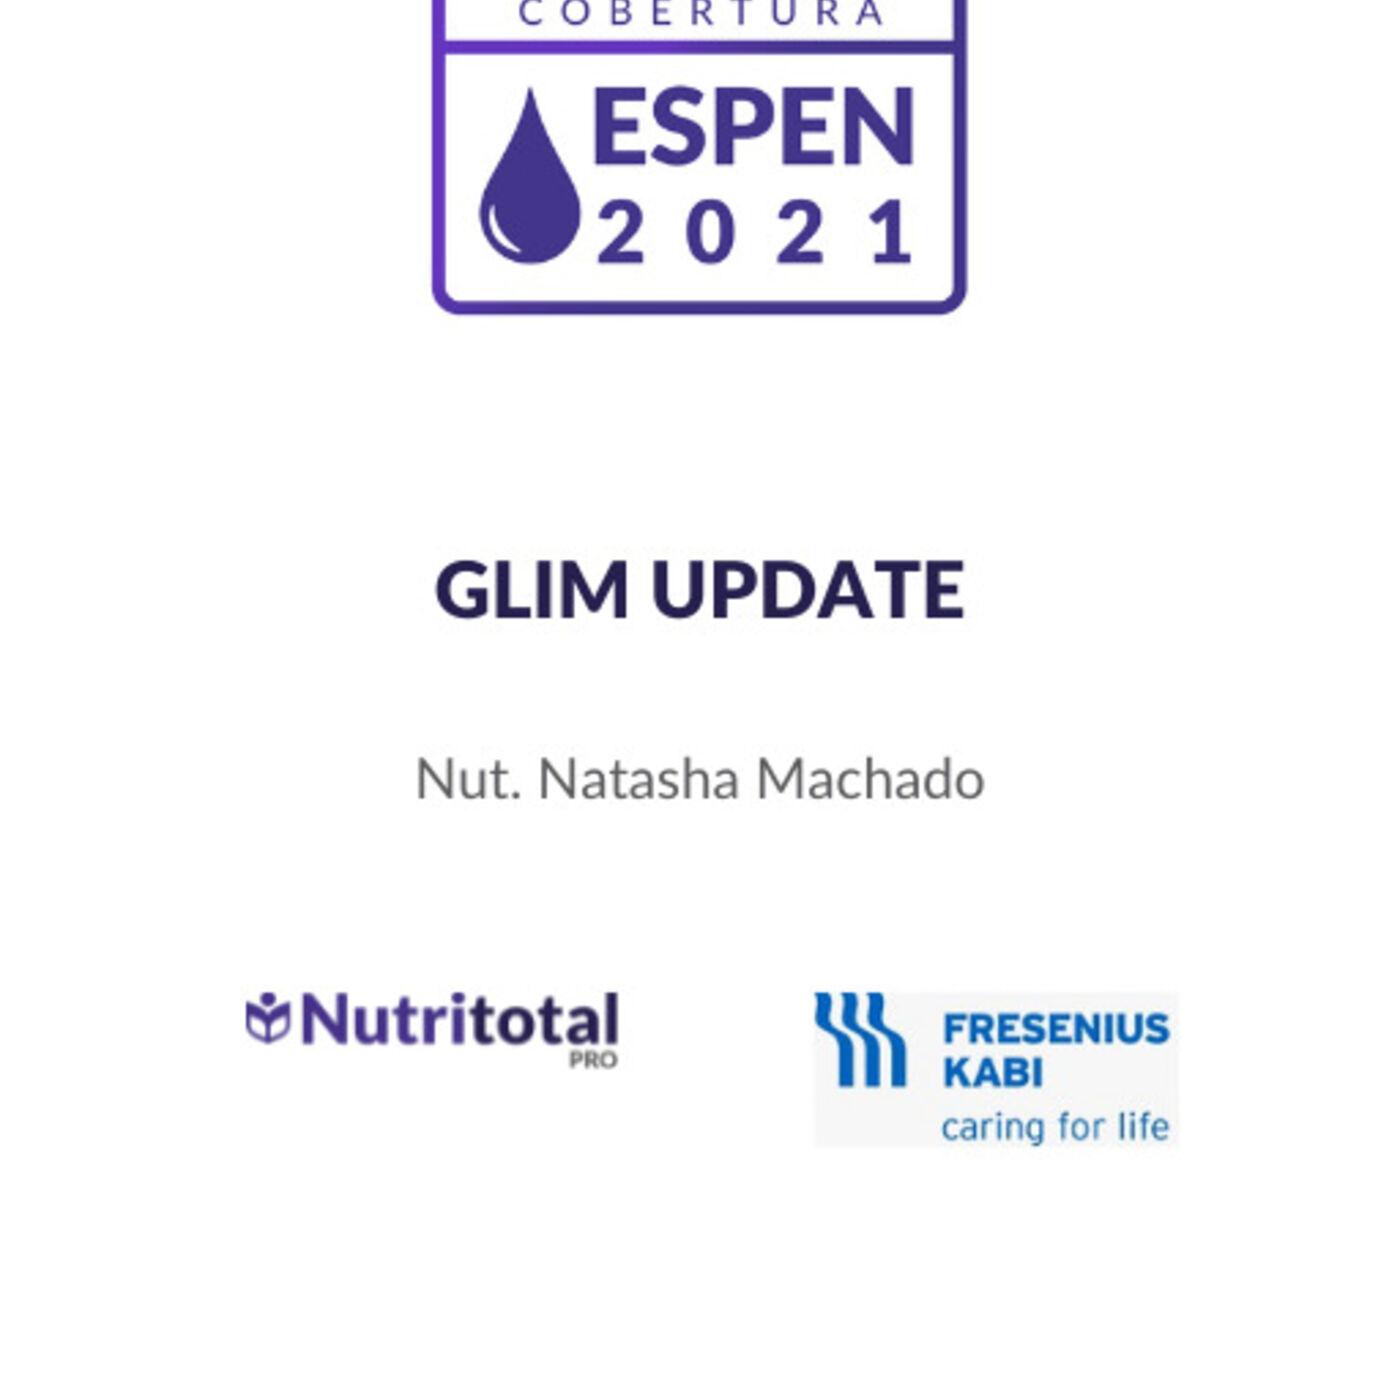 Congresso ESPEN 2021: GLIM Update